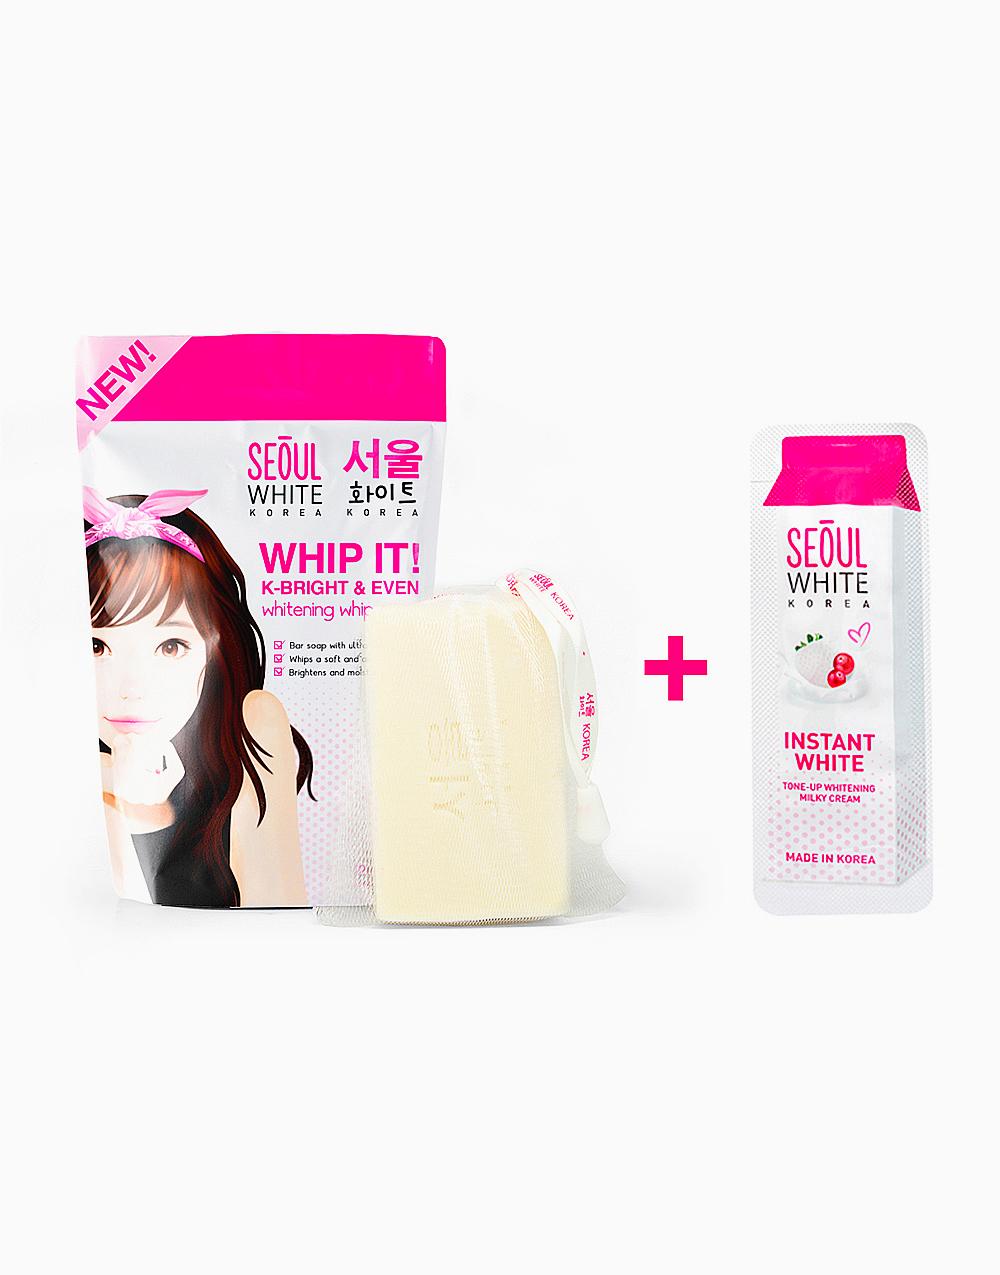 Whip It! Whip Soap + FREE Instant White Tone-Up Whitening Cream Sachet (3g) by Seoul White Korea